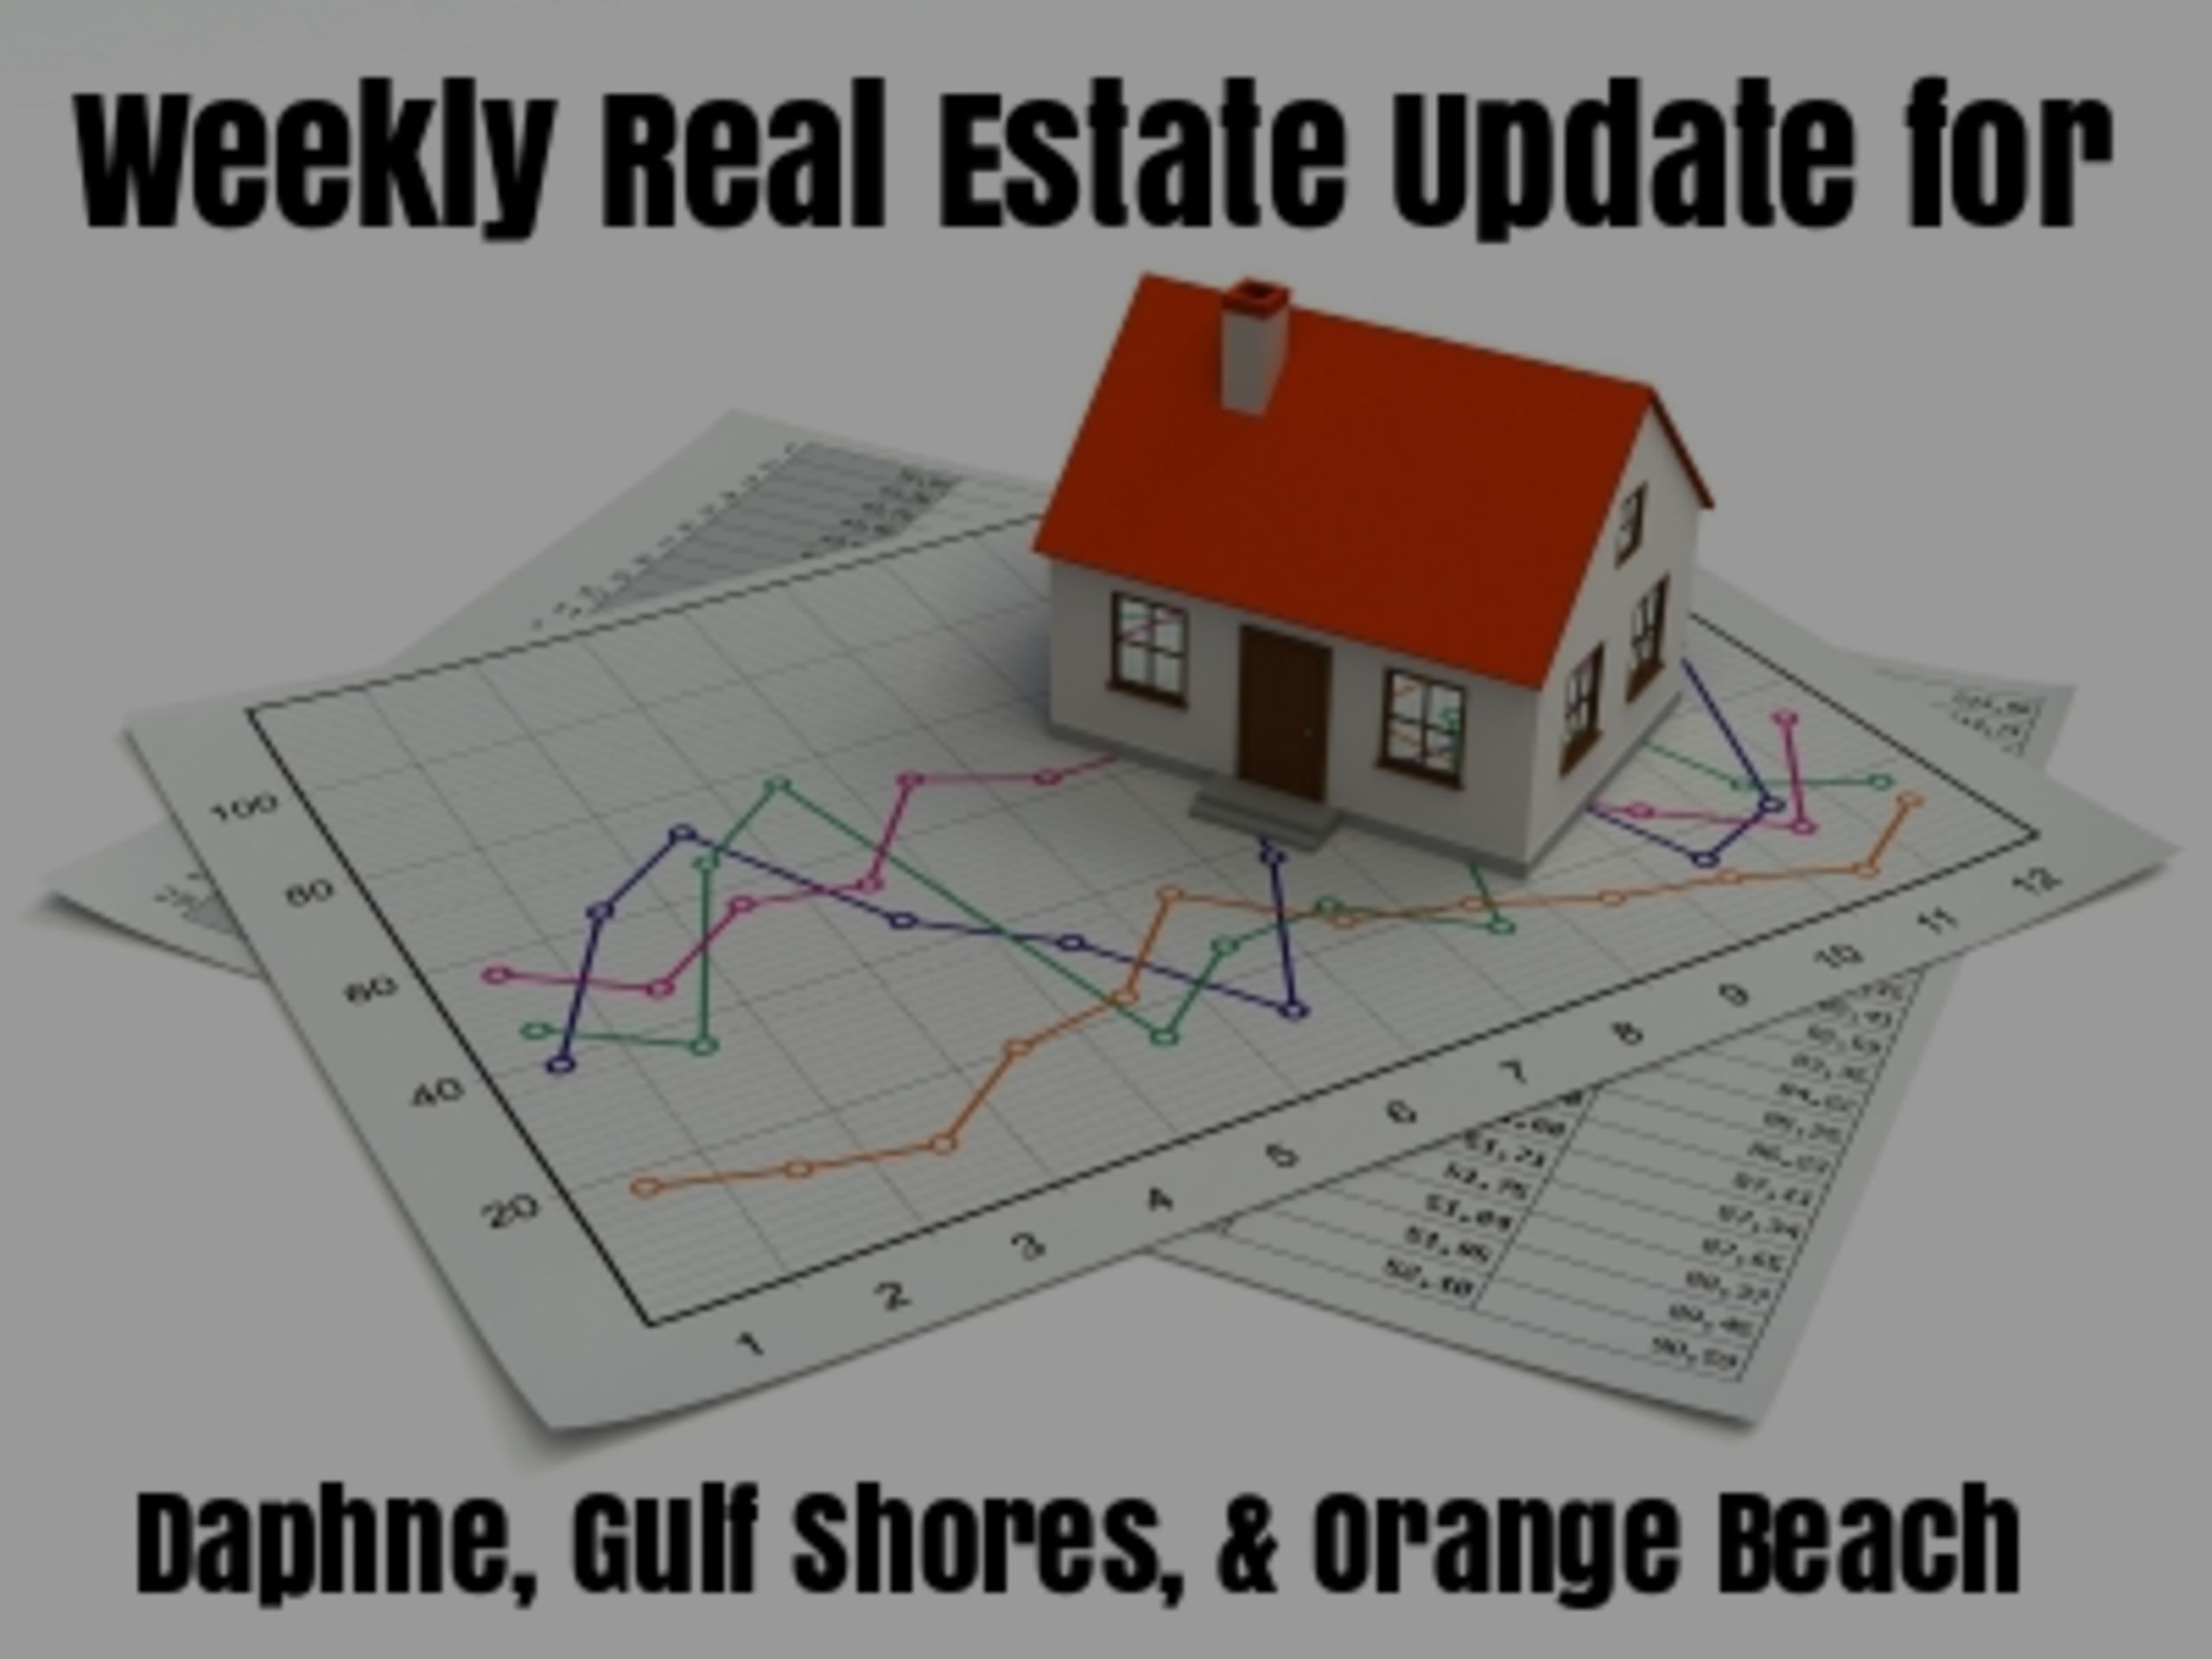 Weekly Real Estate Update – Daphne, Gulf Shores, and Orange Beach – 3/20/17